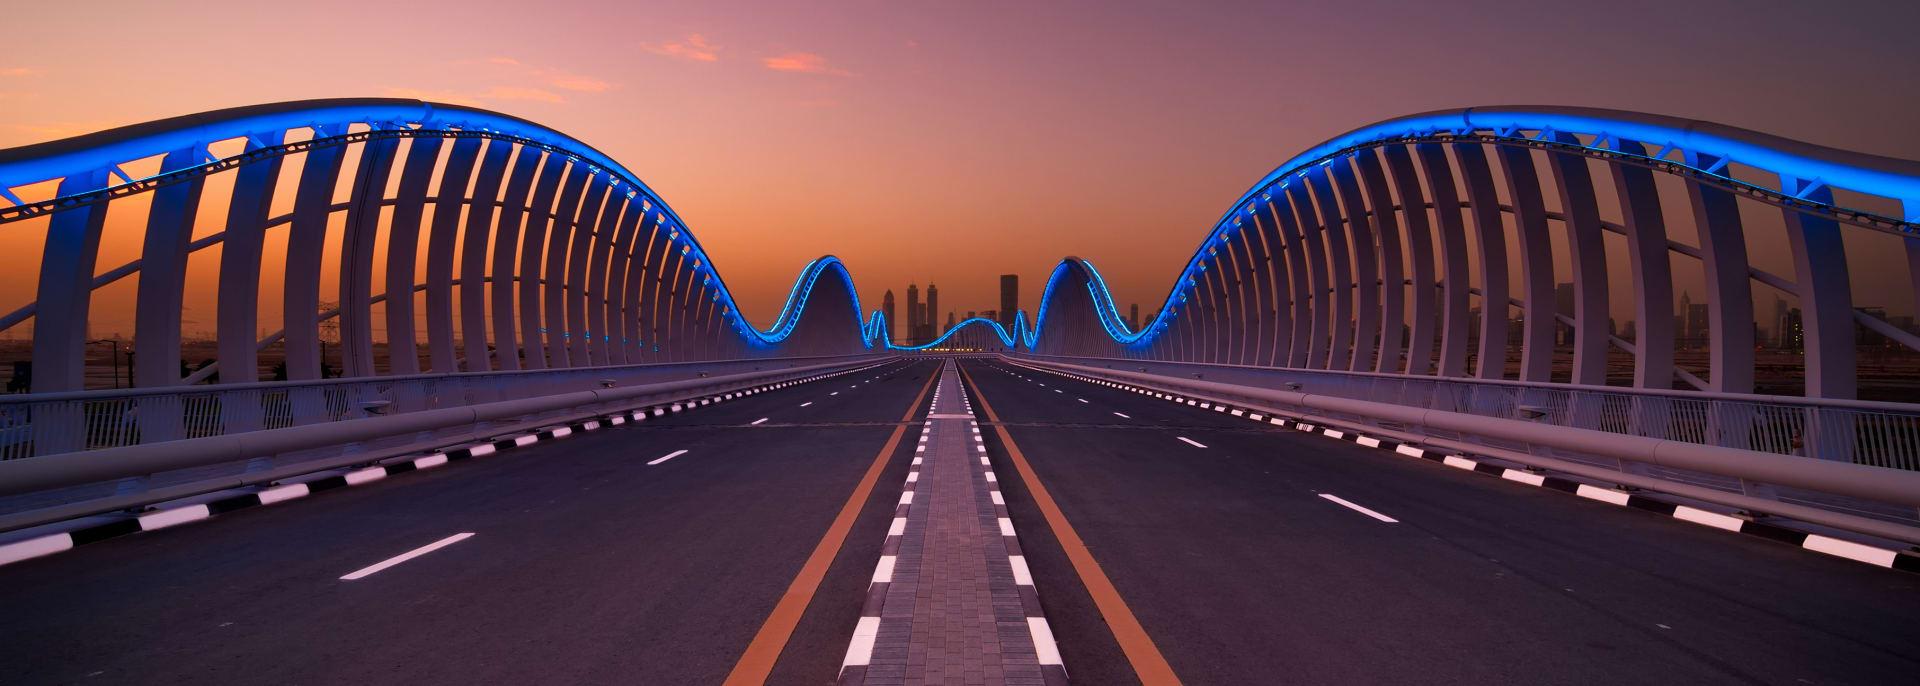 Privatstraße zum Rennplatz Meydan, Dubai